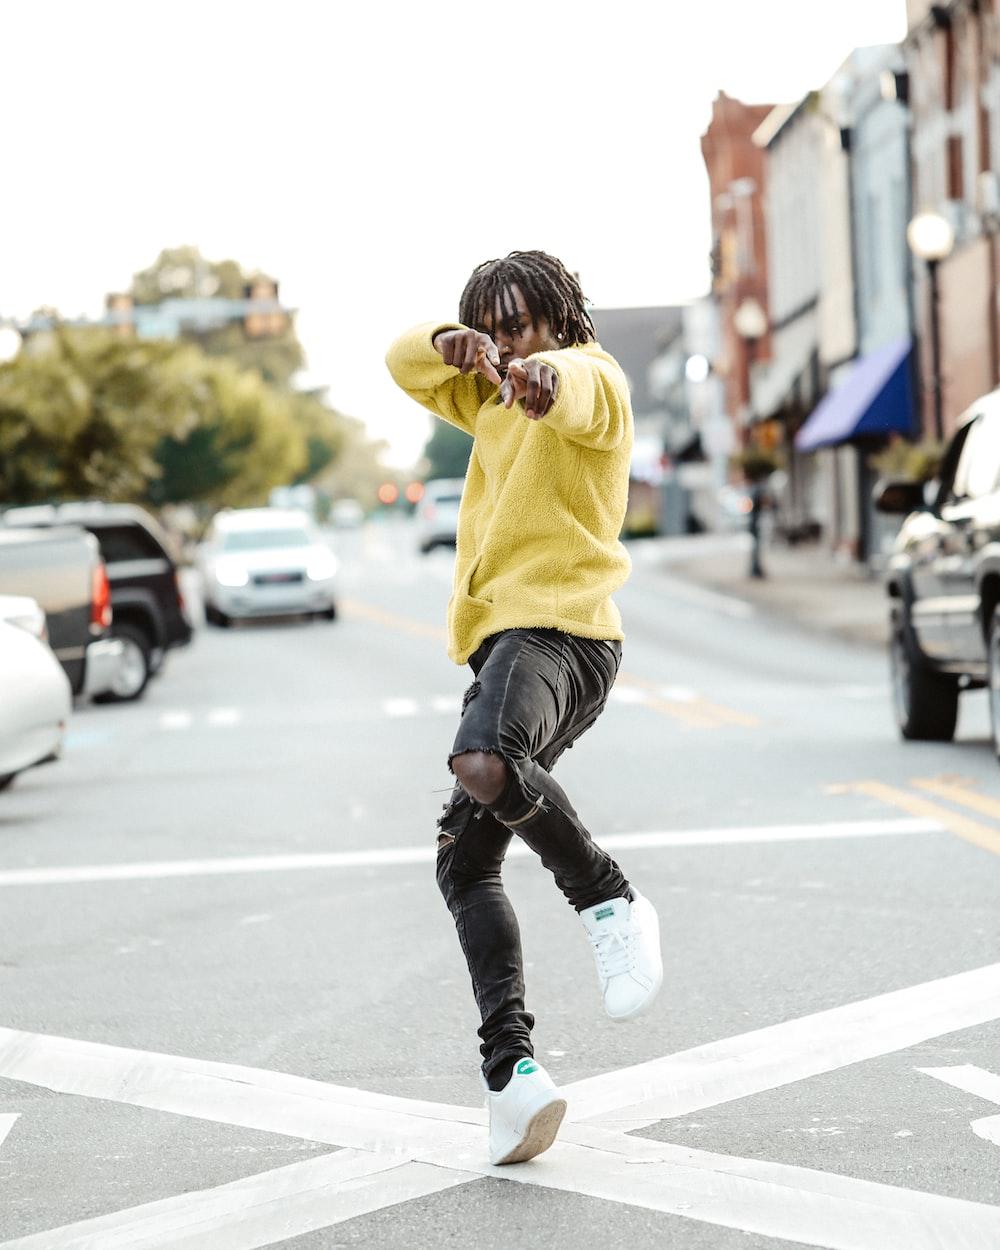 man standing on street at daytime